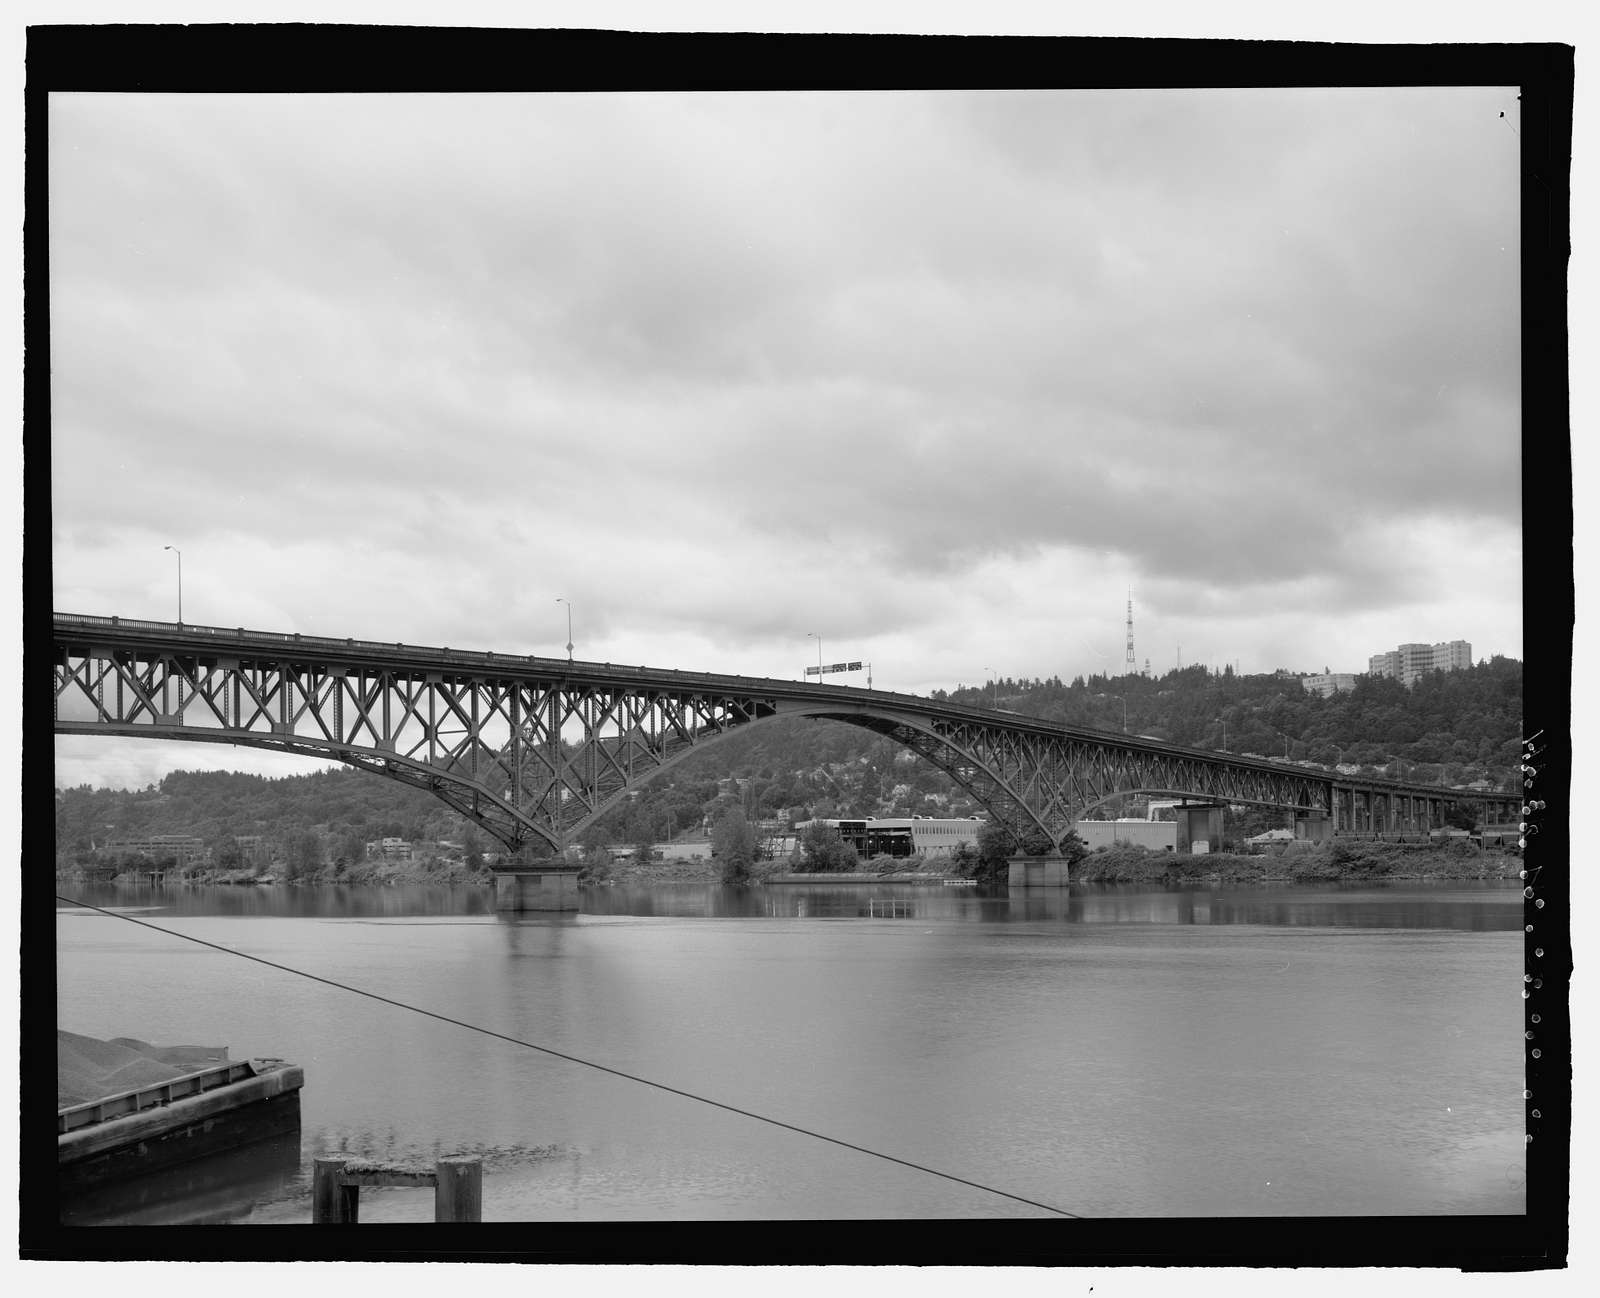 Ross Island Bridge, Spanning Willamette River at Powell Boulevard, Portland, Multnomah County, OR